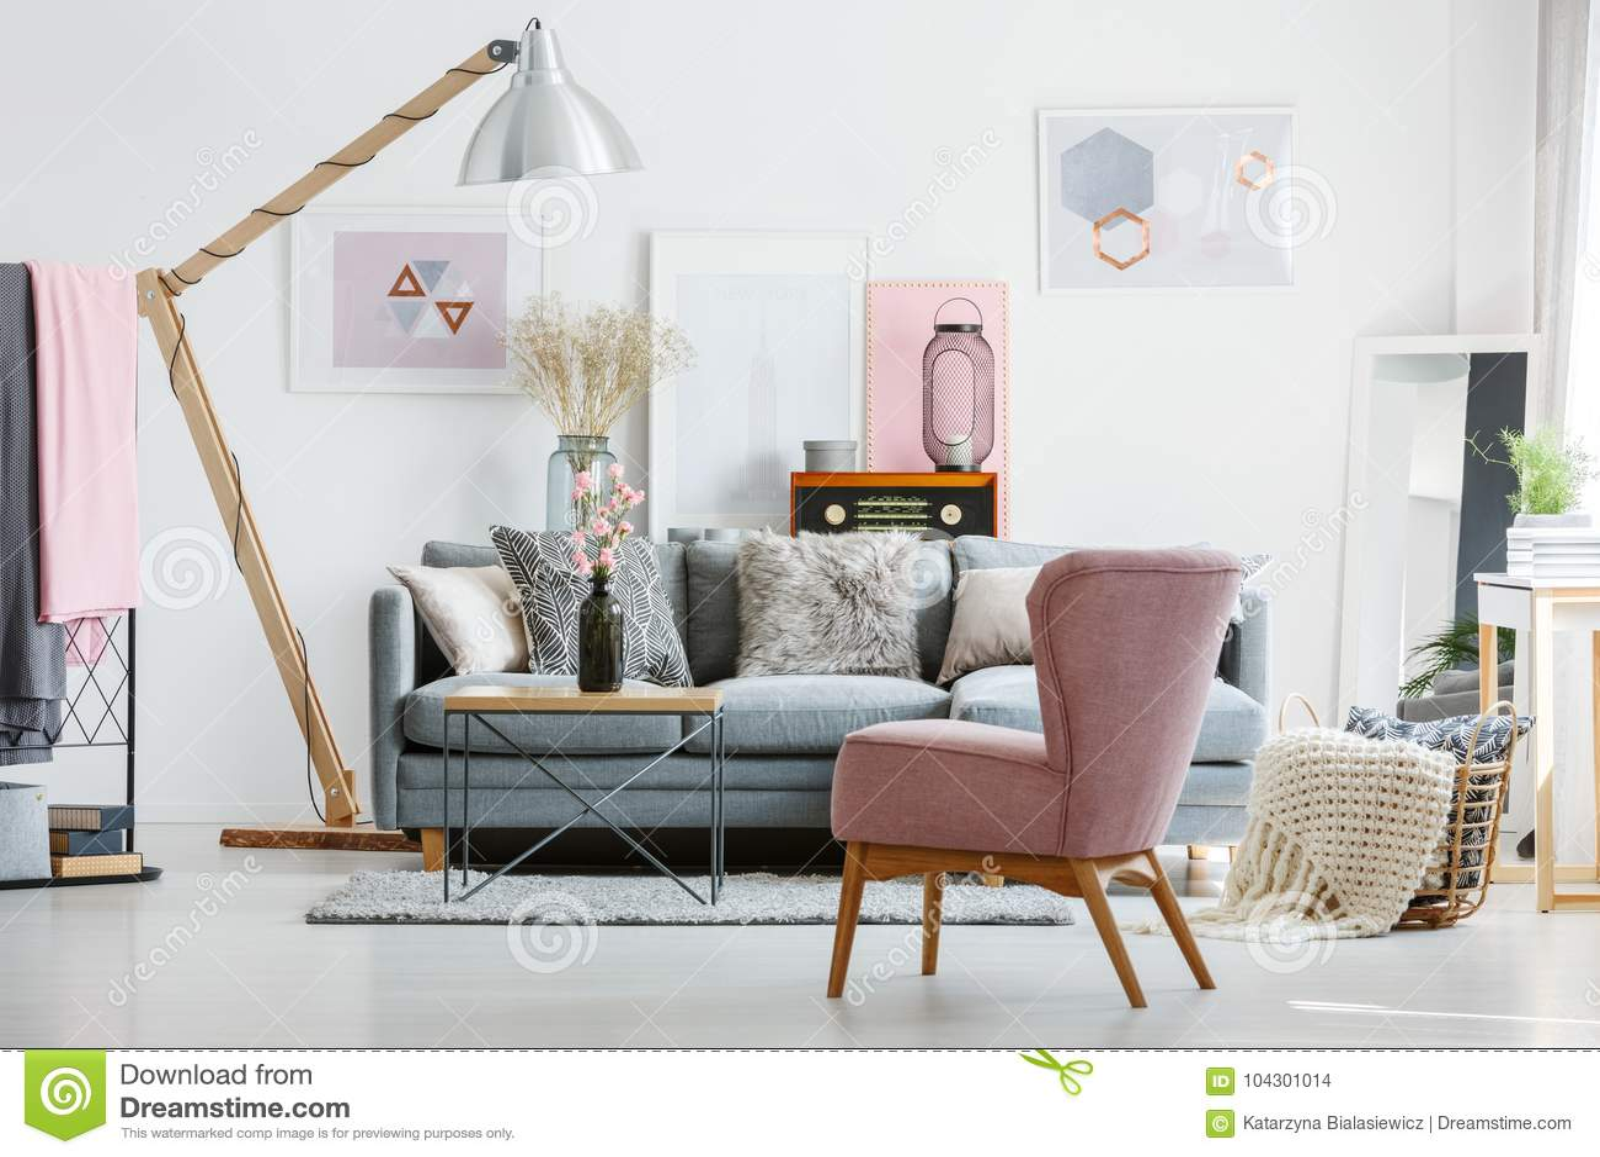 Stylish Living Room With Radio Stock Photo - Image of bright ...